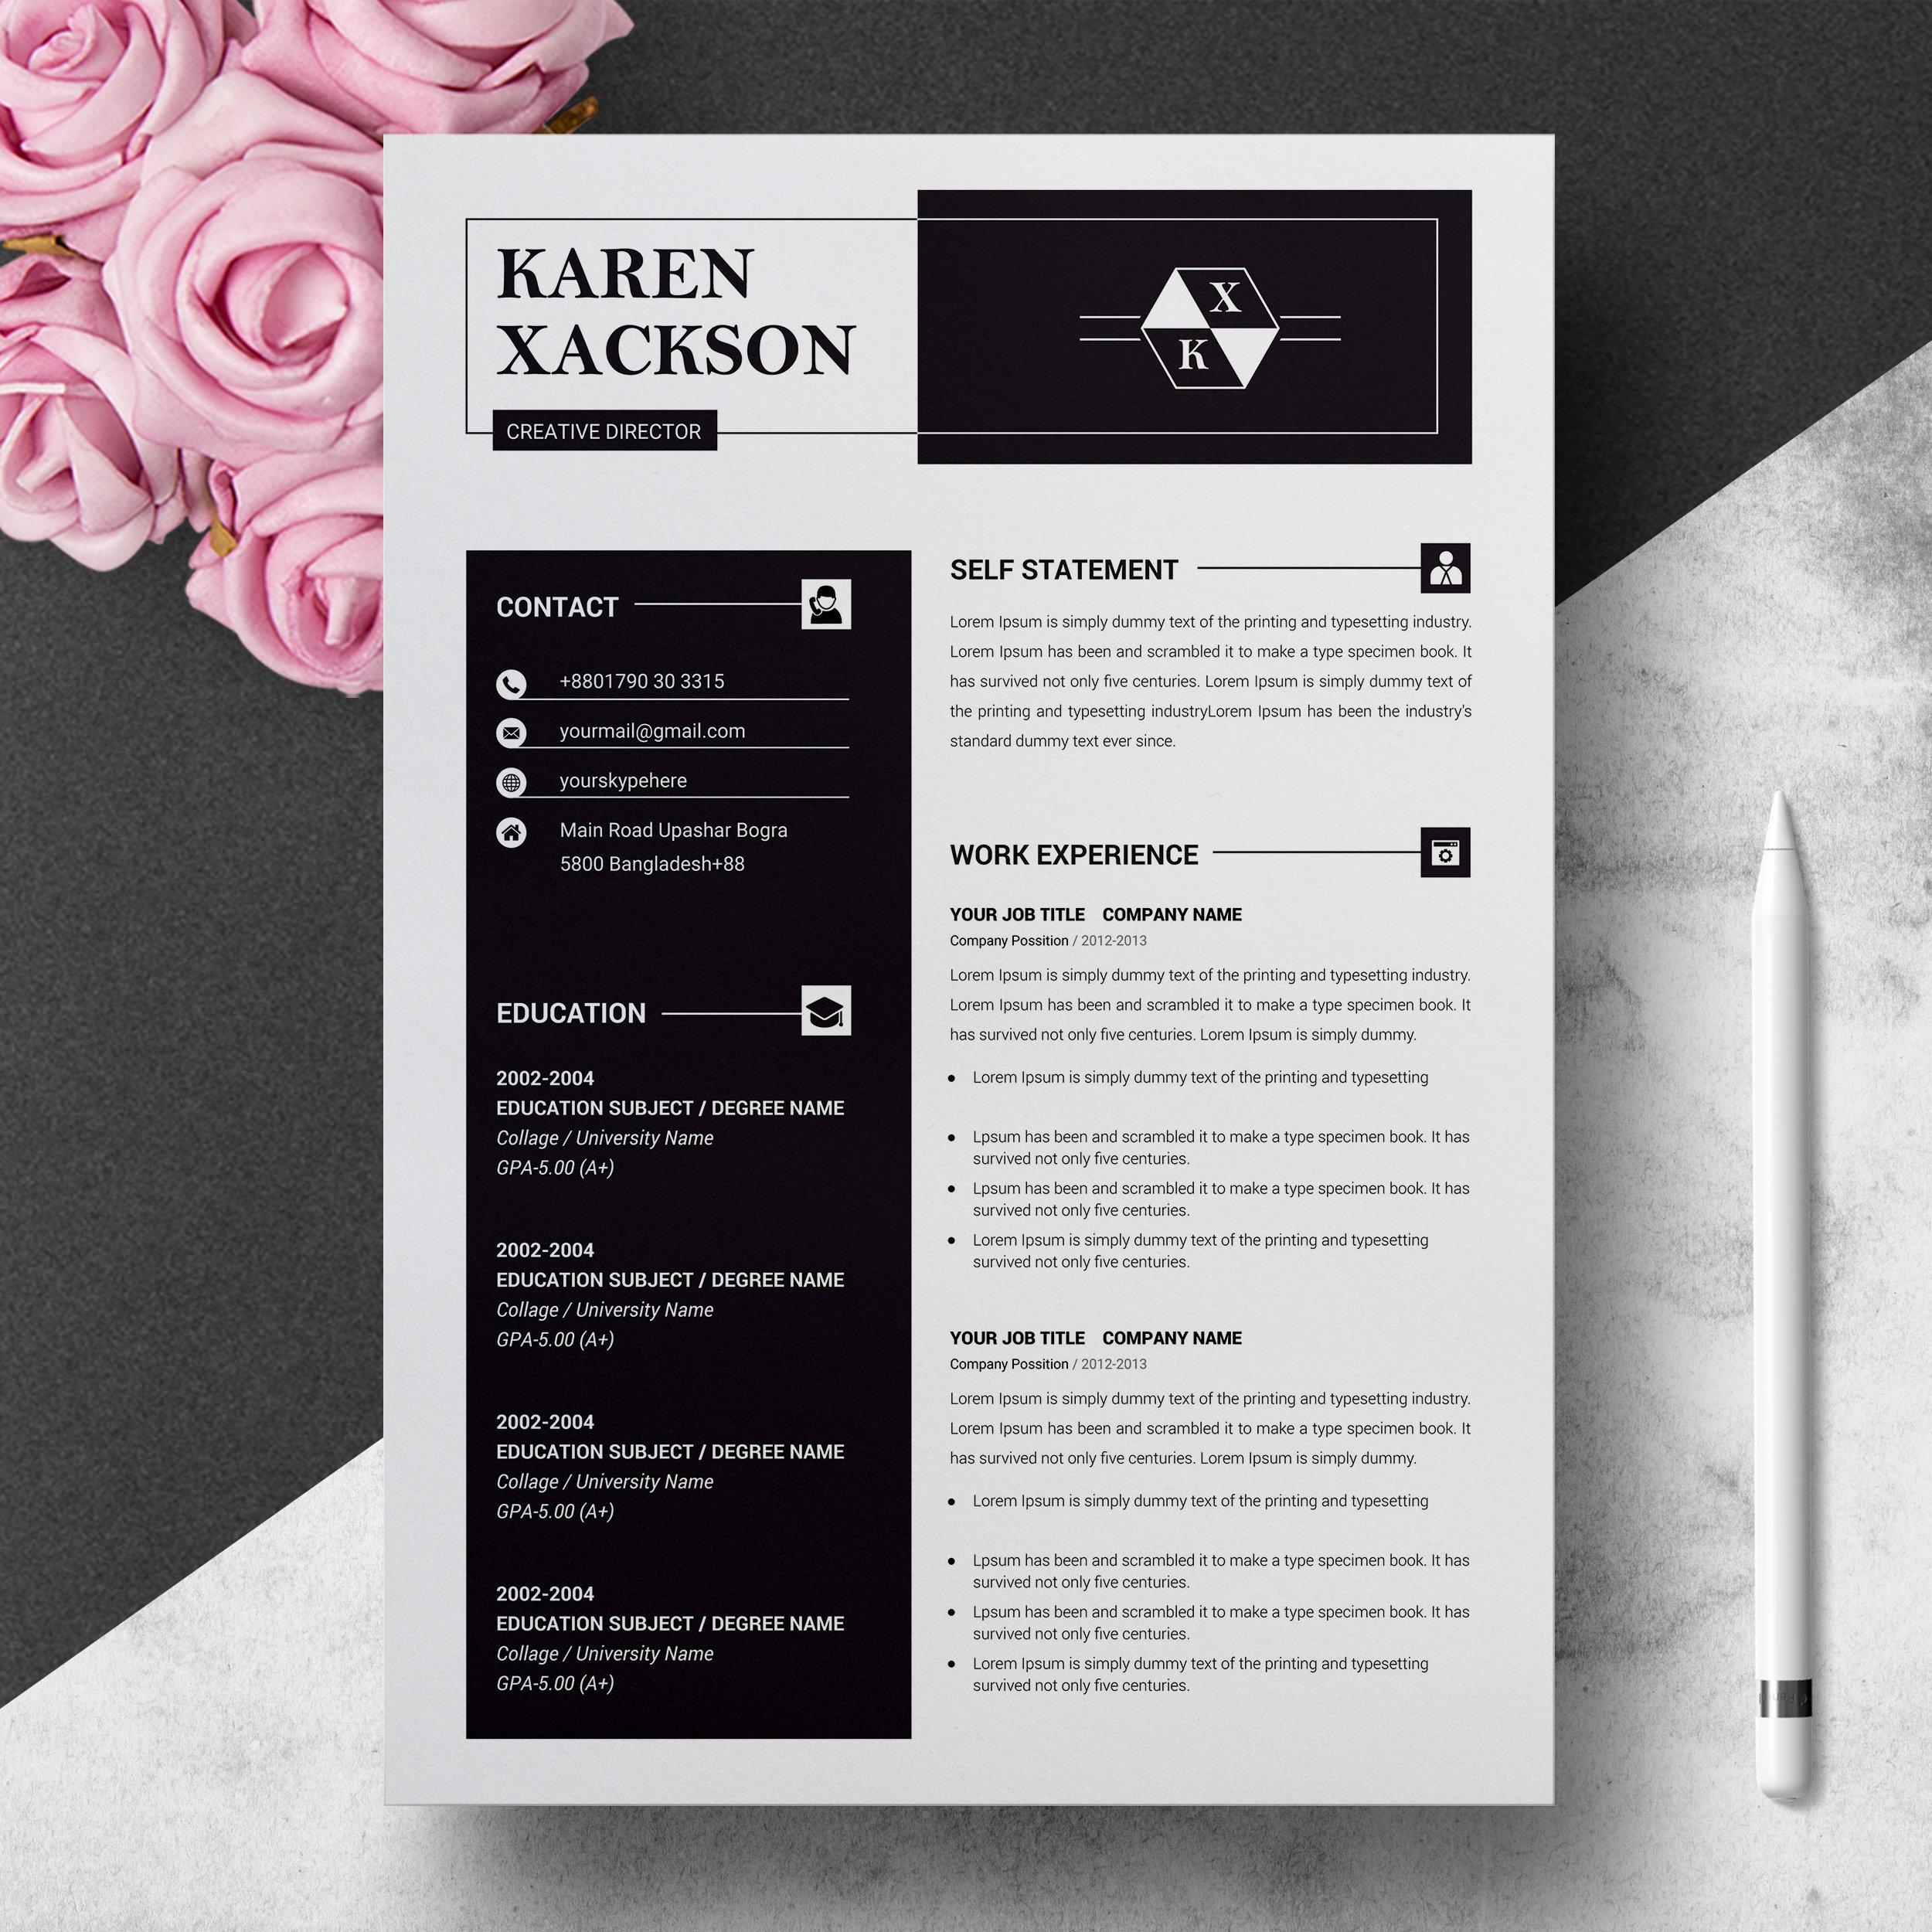 Minimalist Creative Resume Template Modern & Professional   Etsy